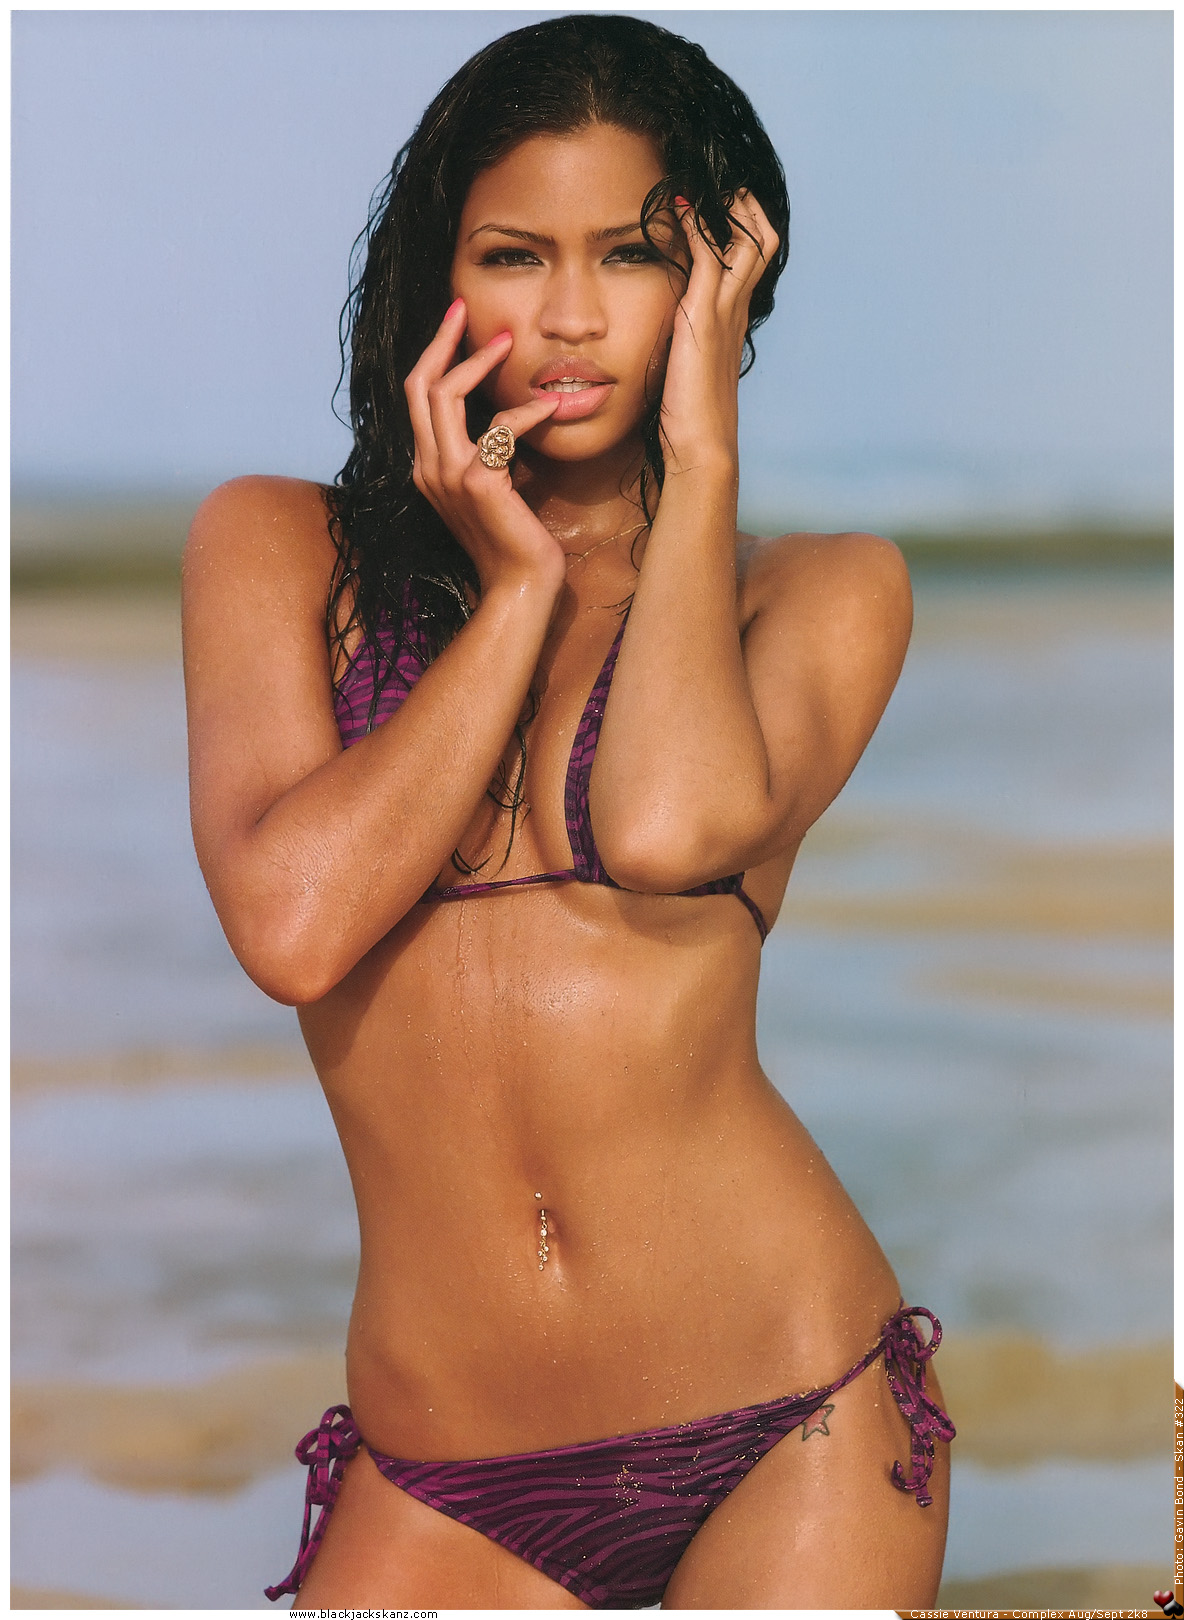 Bikini cassie pics ventura